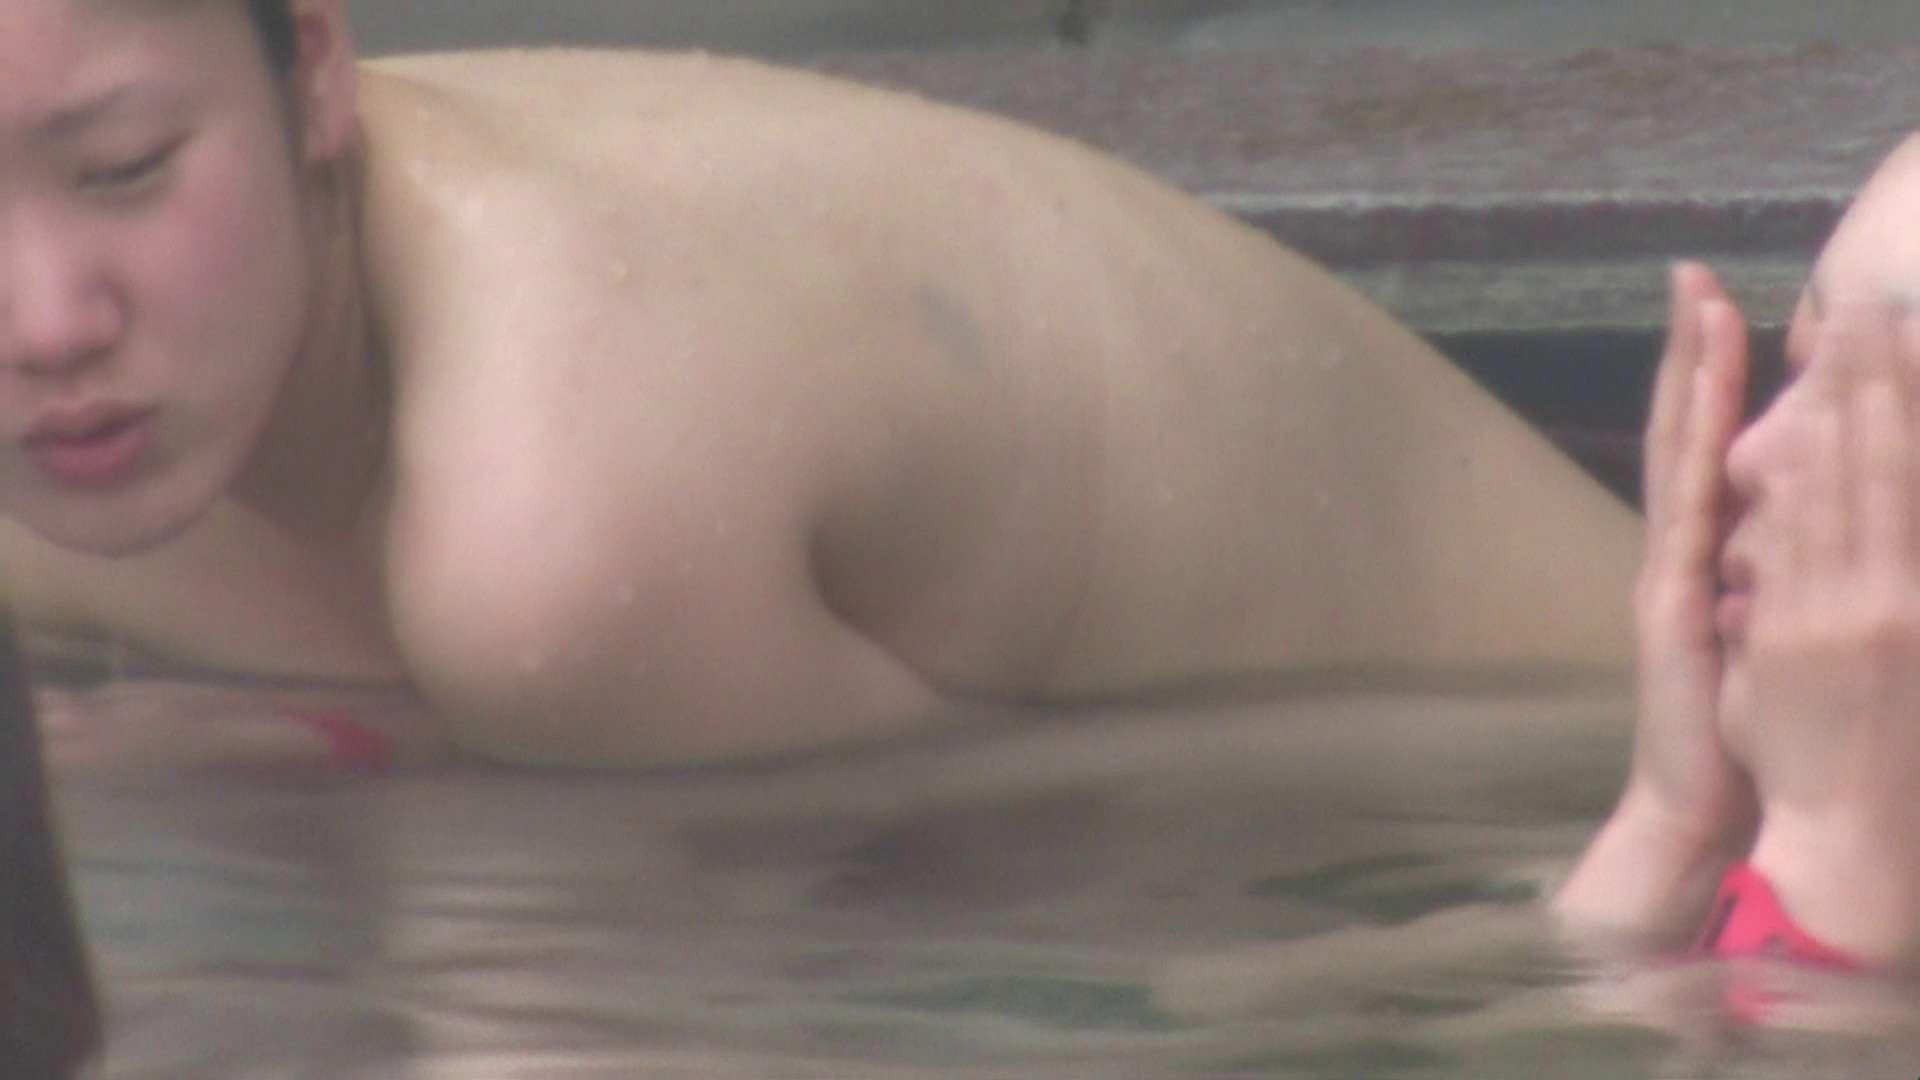 Aquaな露天風呂Vol.51【VIP限定】 OLセックス 盗み撮りオマンコ動画キャプチャ 56画像 11